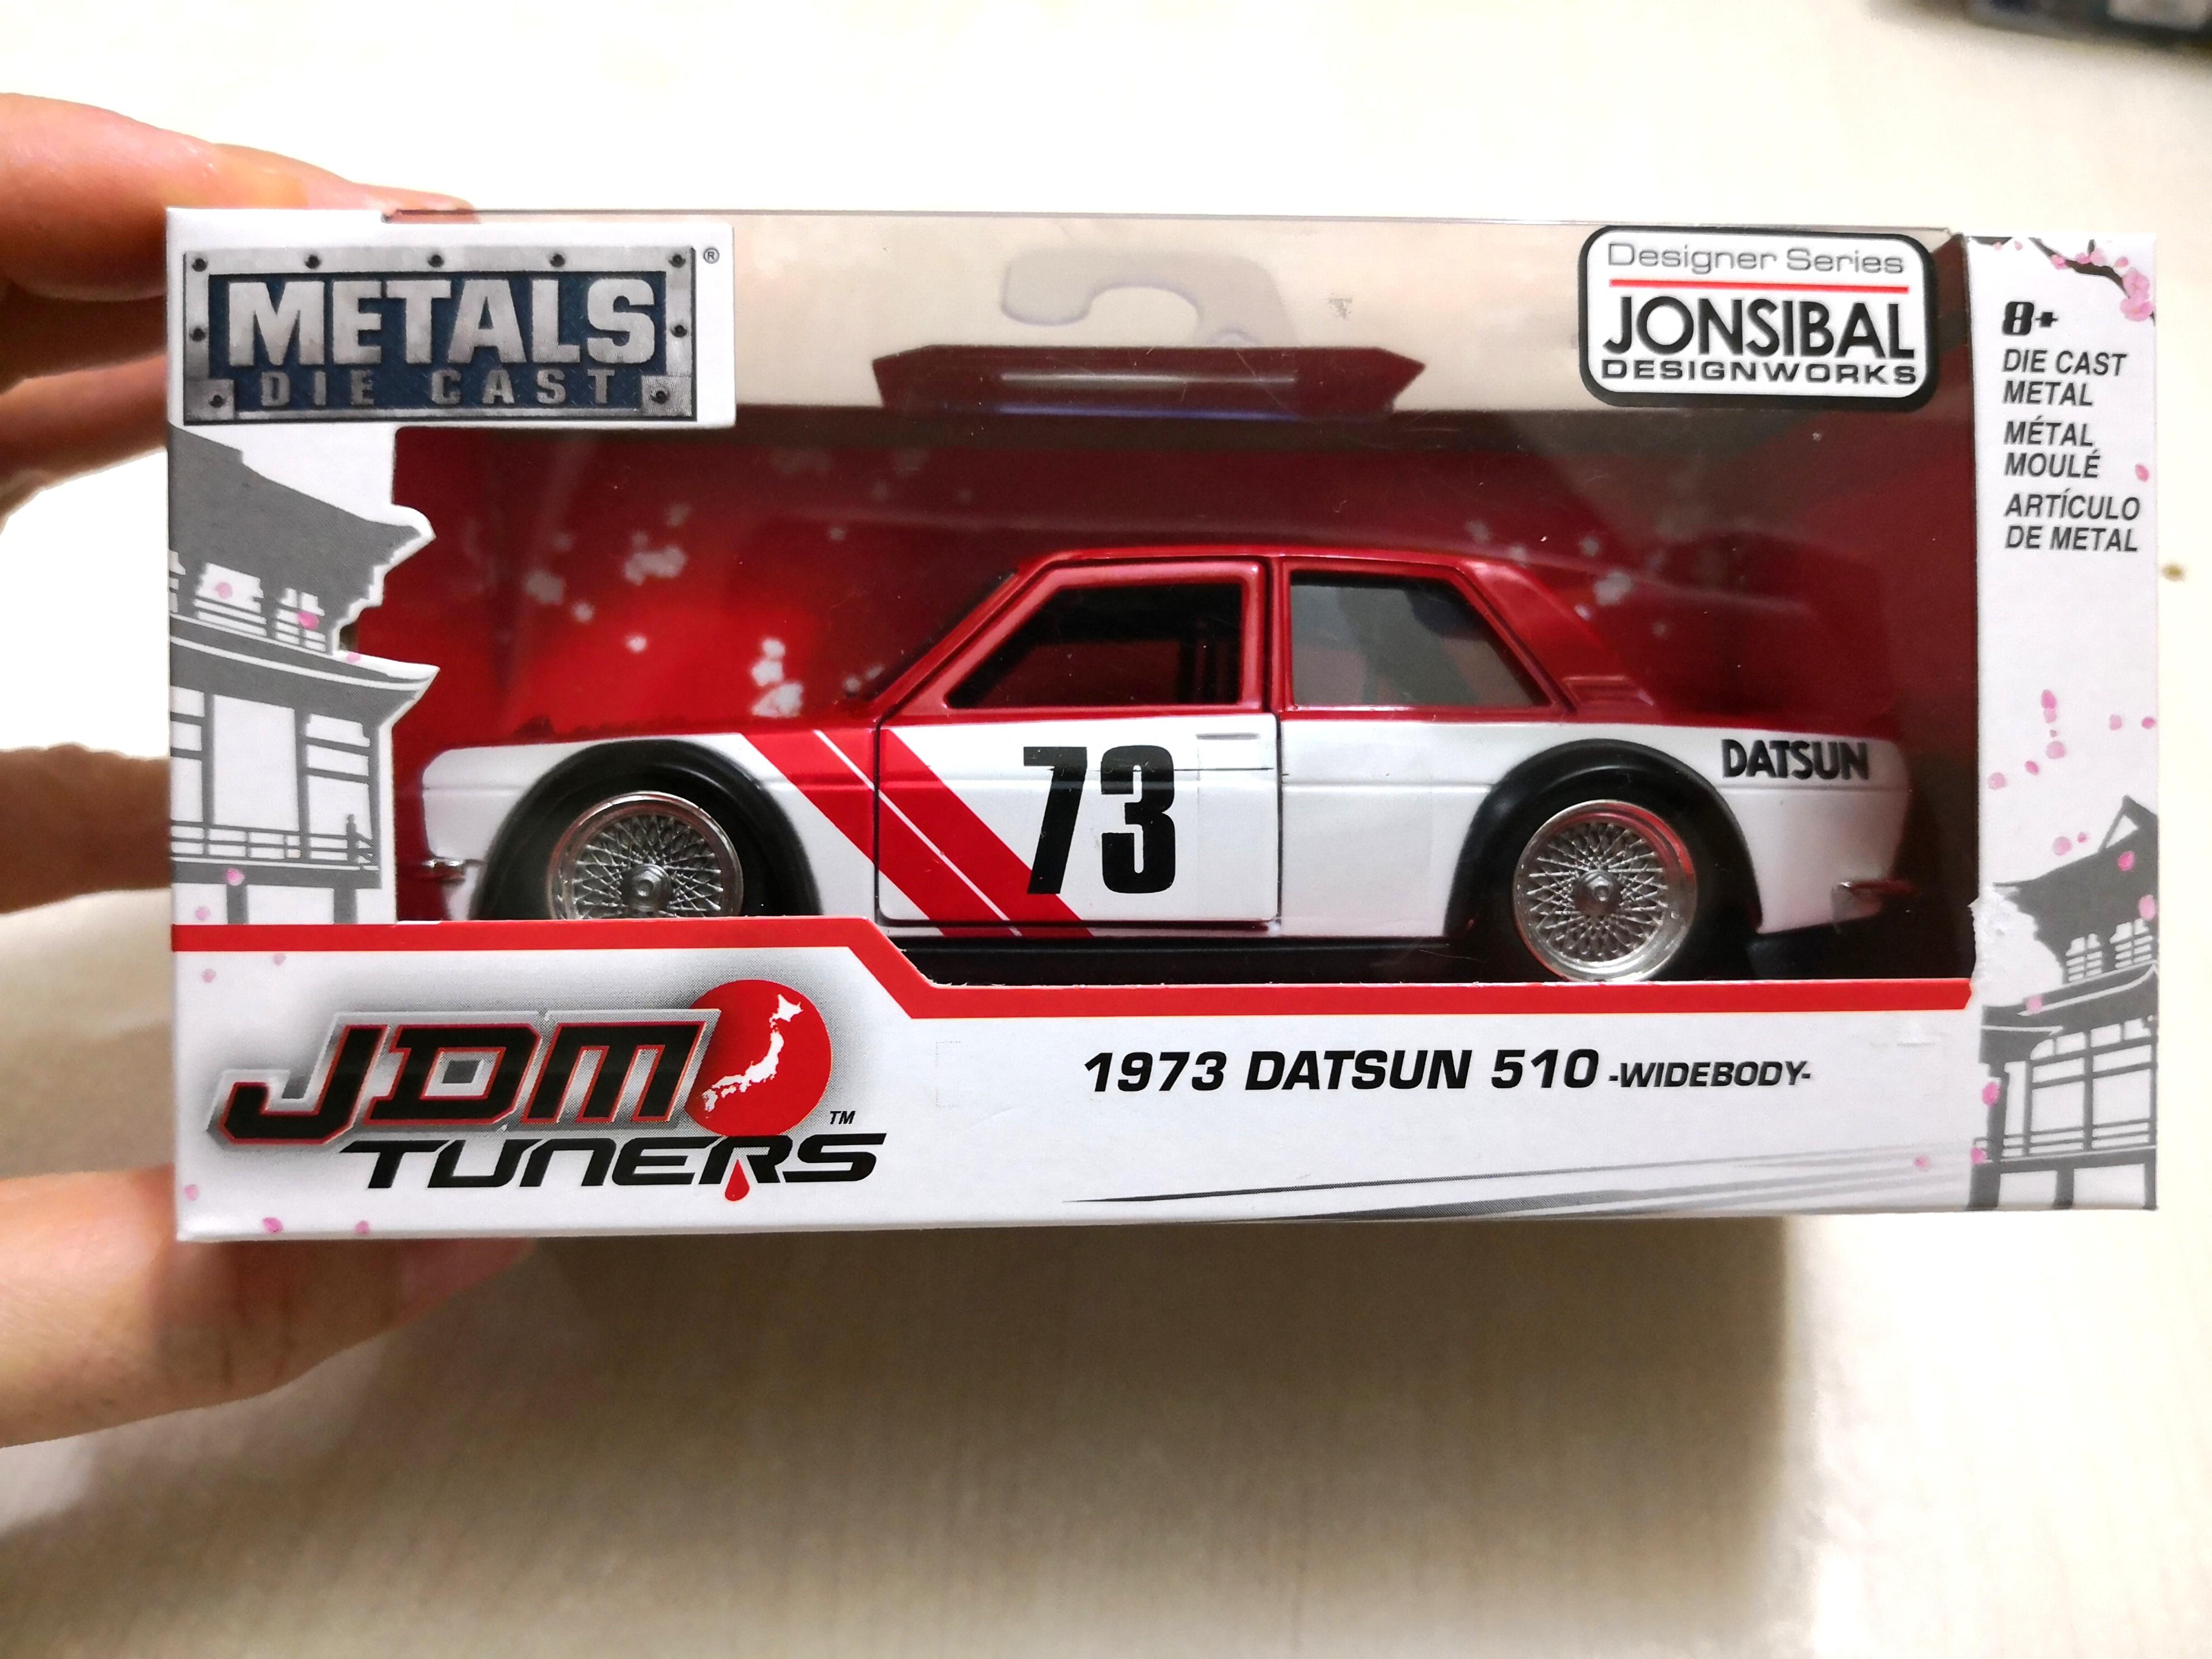 '73 Datsun 510 Widebody Designer Series Jonsibal Designworks 2 2018 JDM Tuners